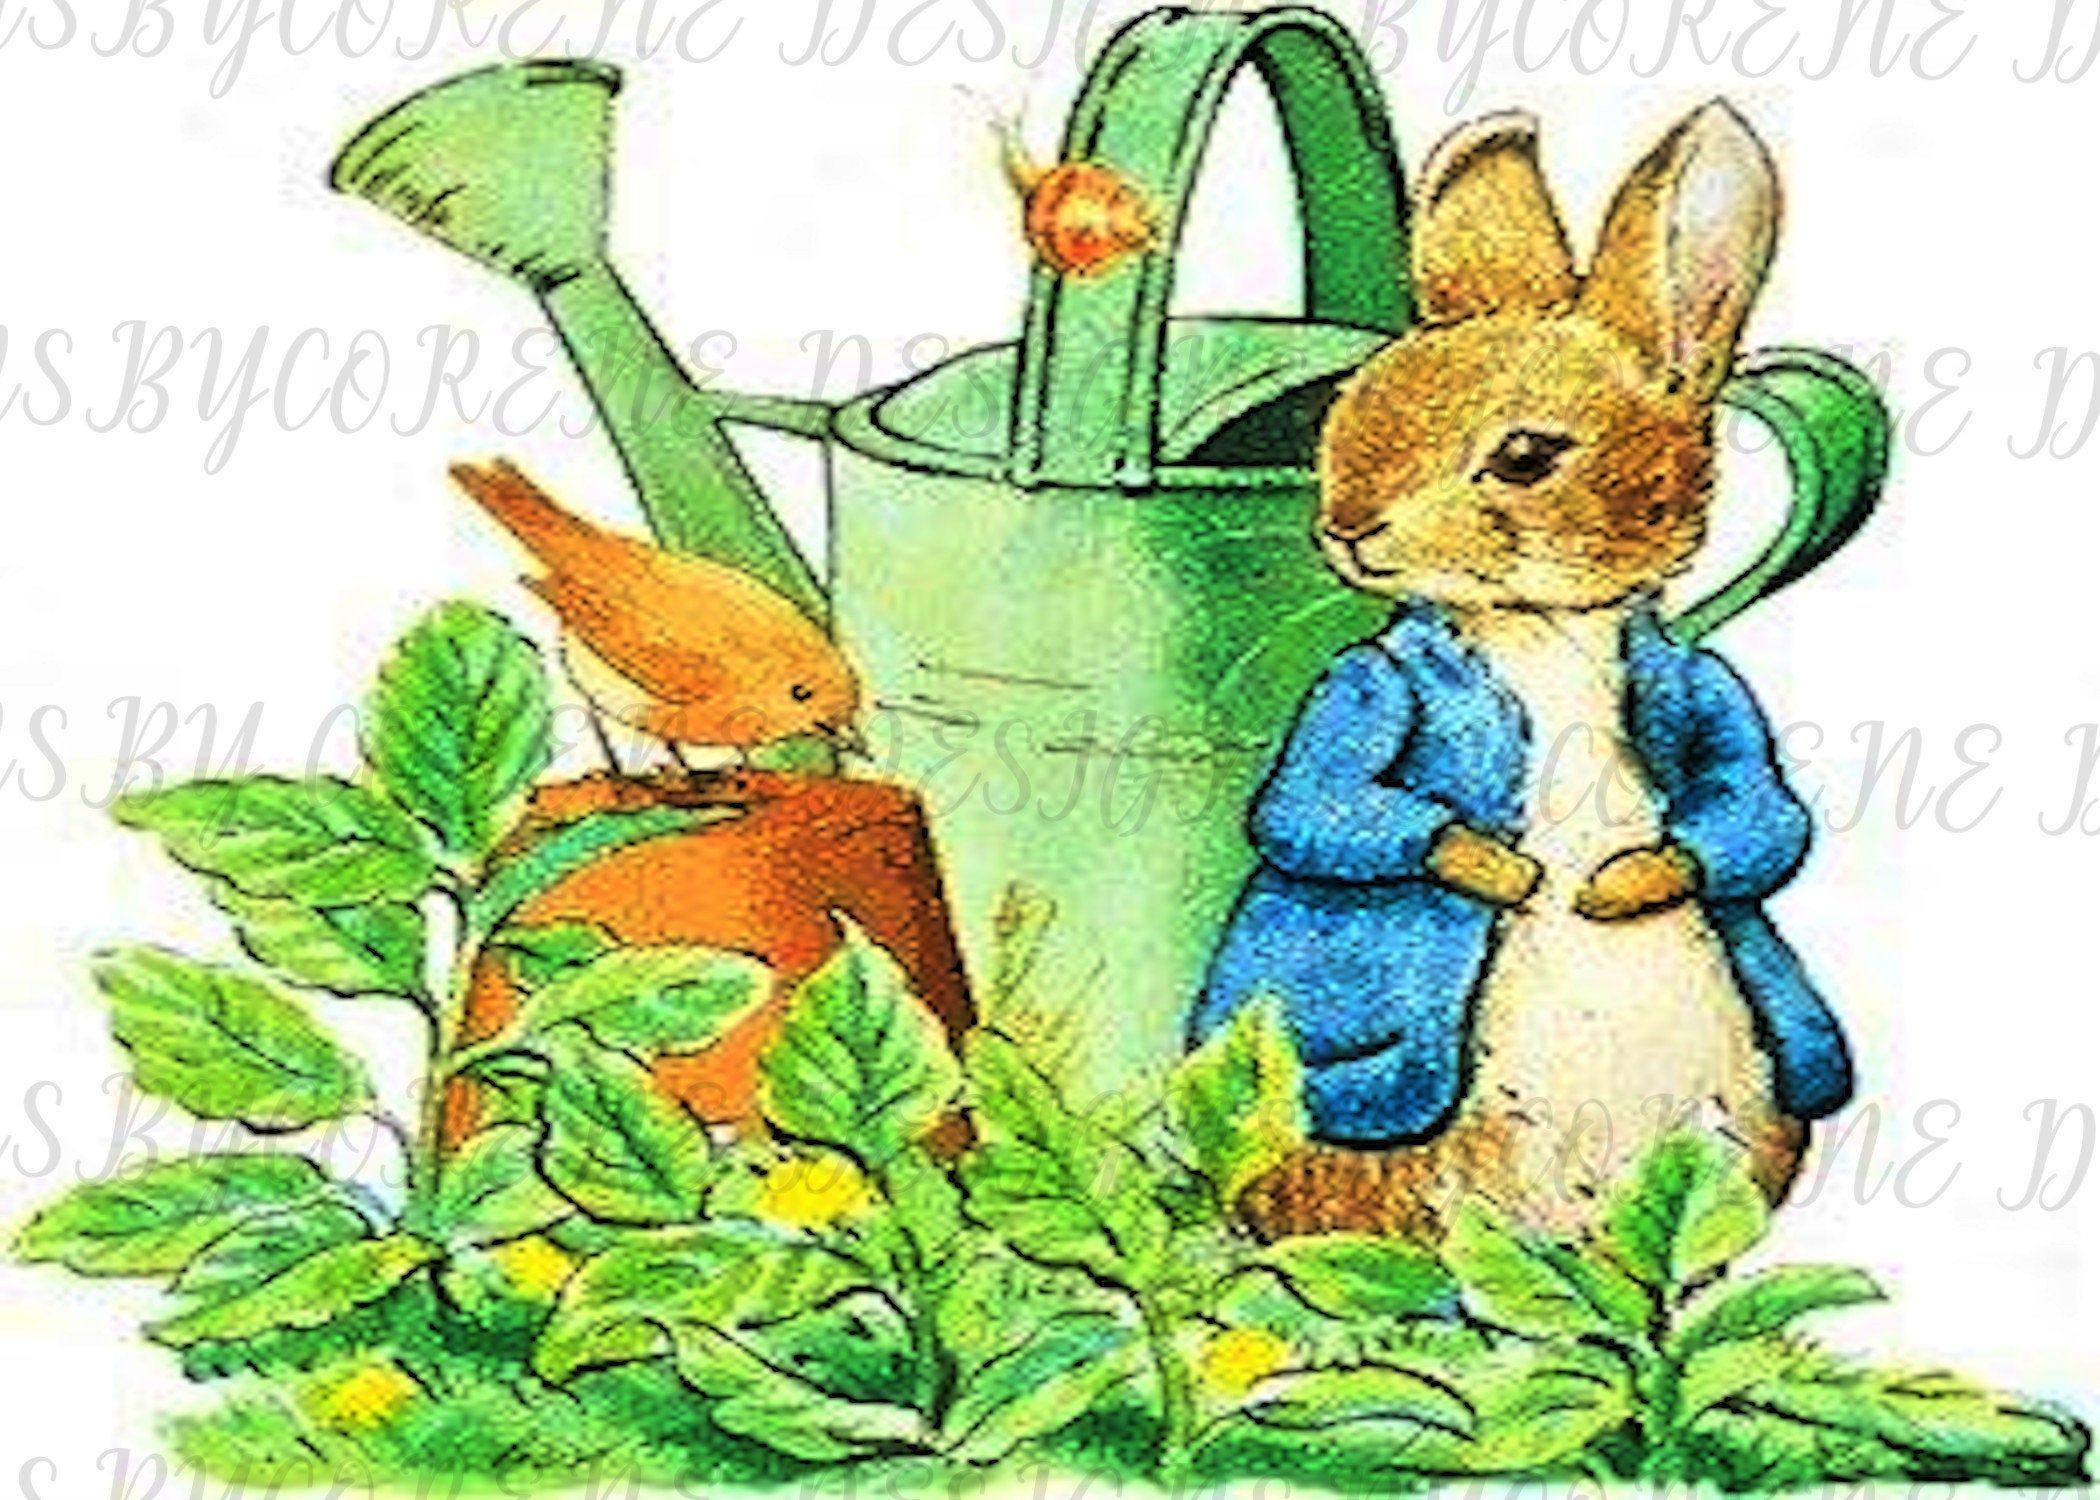 Printable Peter Rabbit Clip Art Digital Download Printable Etsy In 2020 Peter Rabbit And Friends Beatrix Potter Illustrations Peter Rabbit Illustration